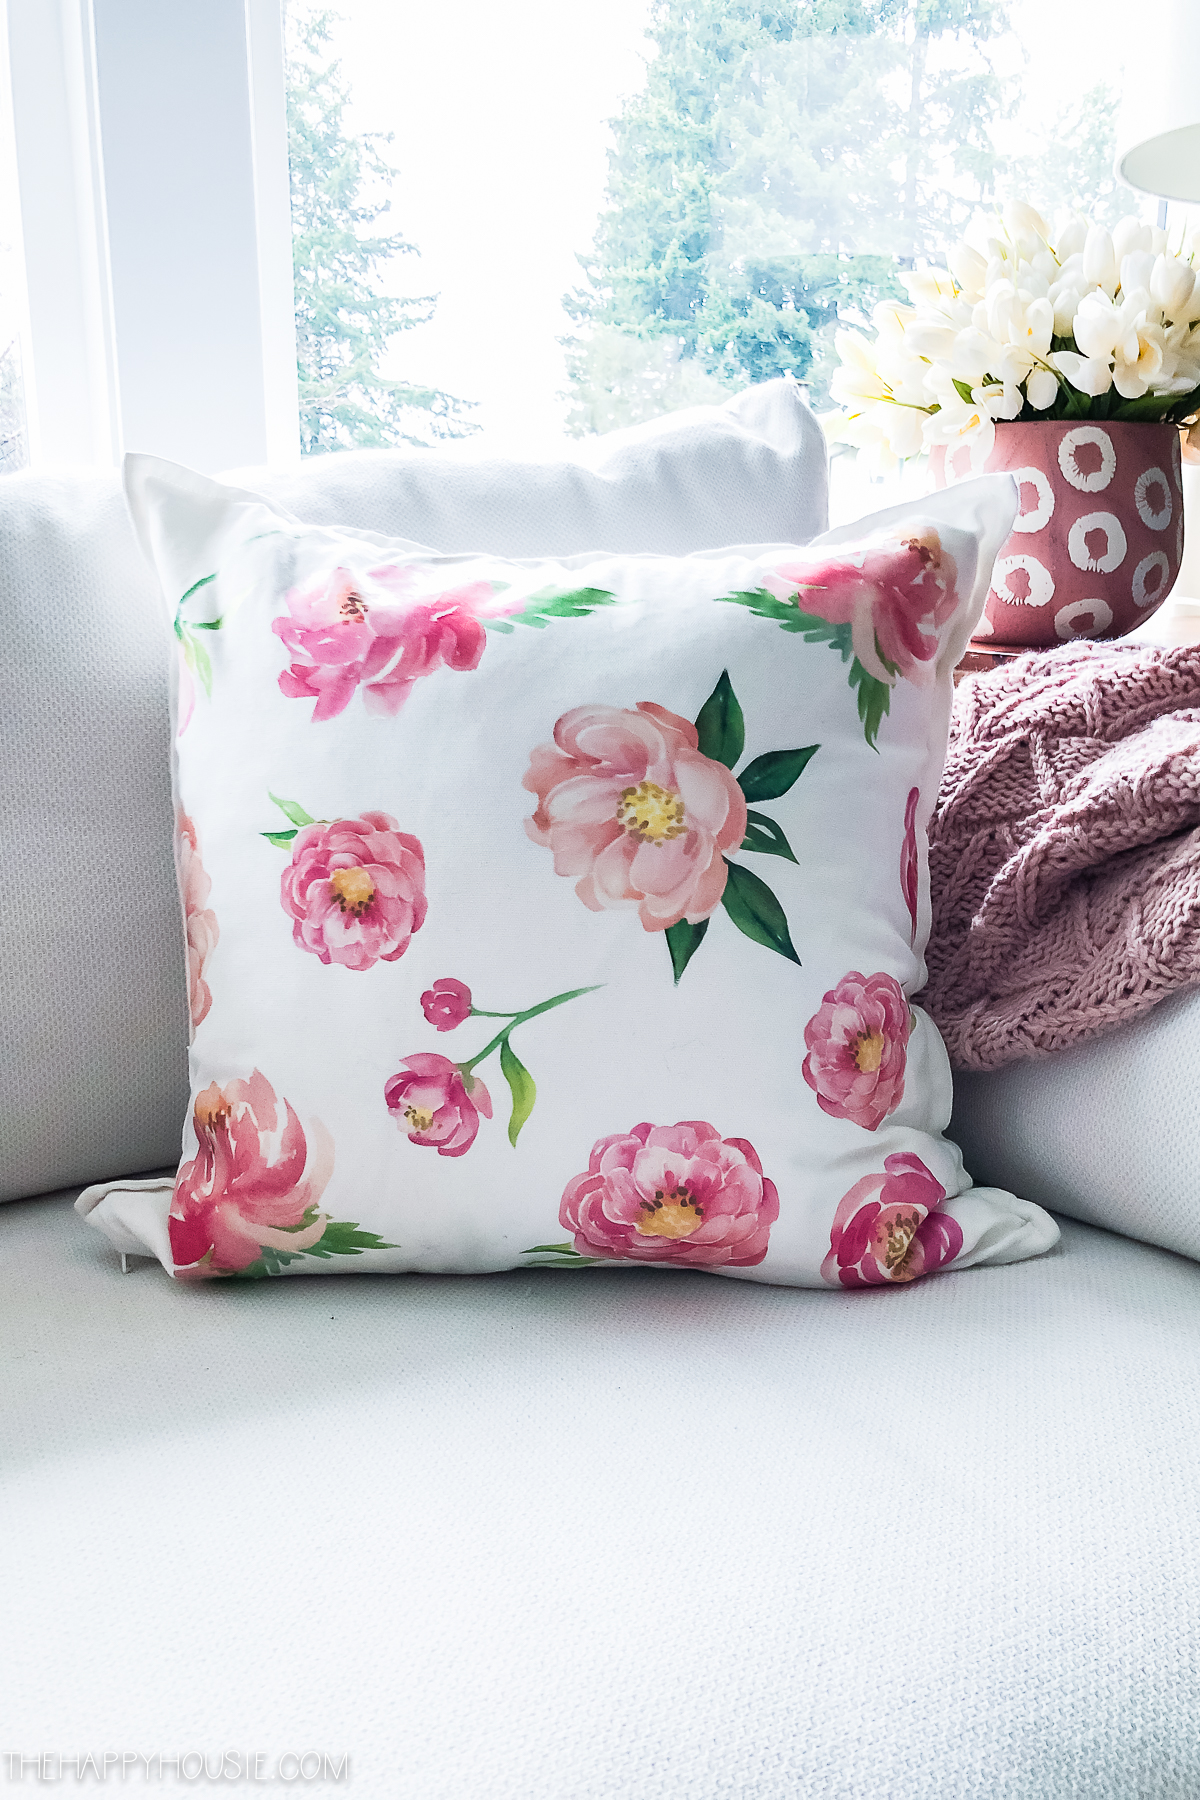 Floral pillow beside a pink throw.